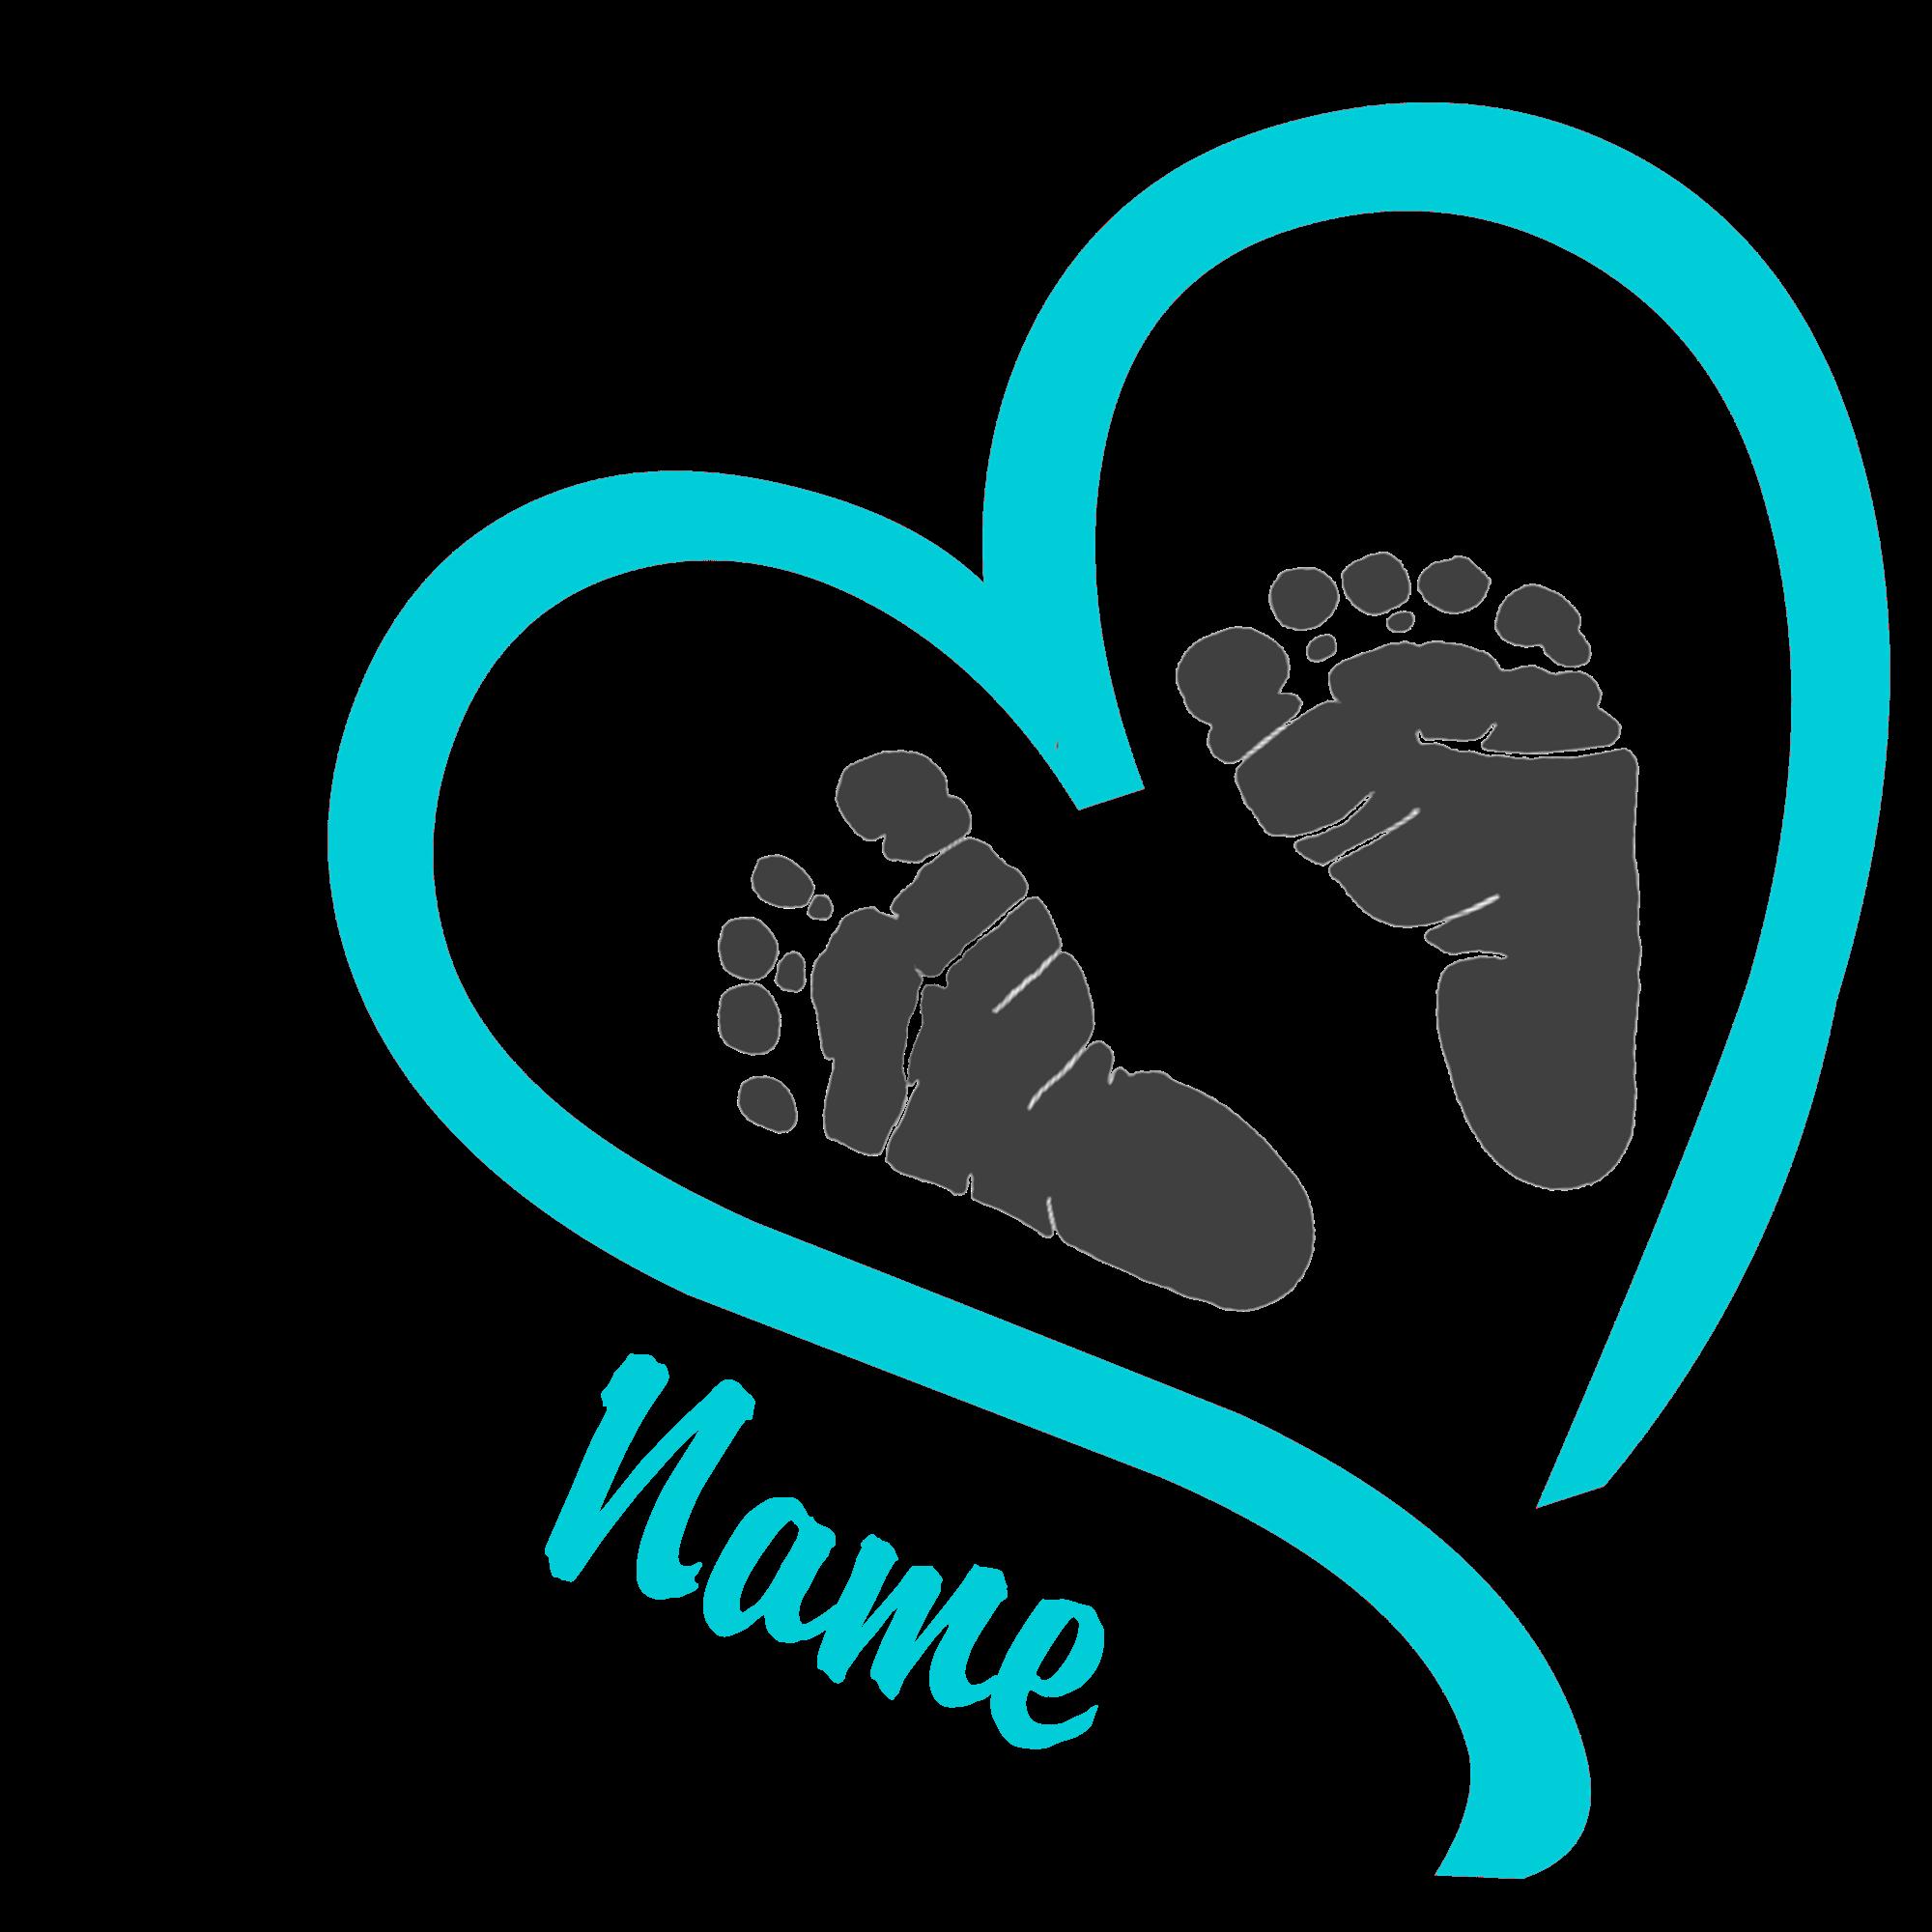 Free baby footprint border clipart. Feet clip art gclipart